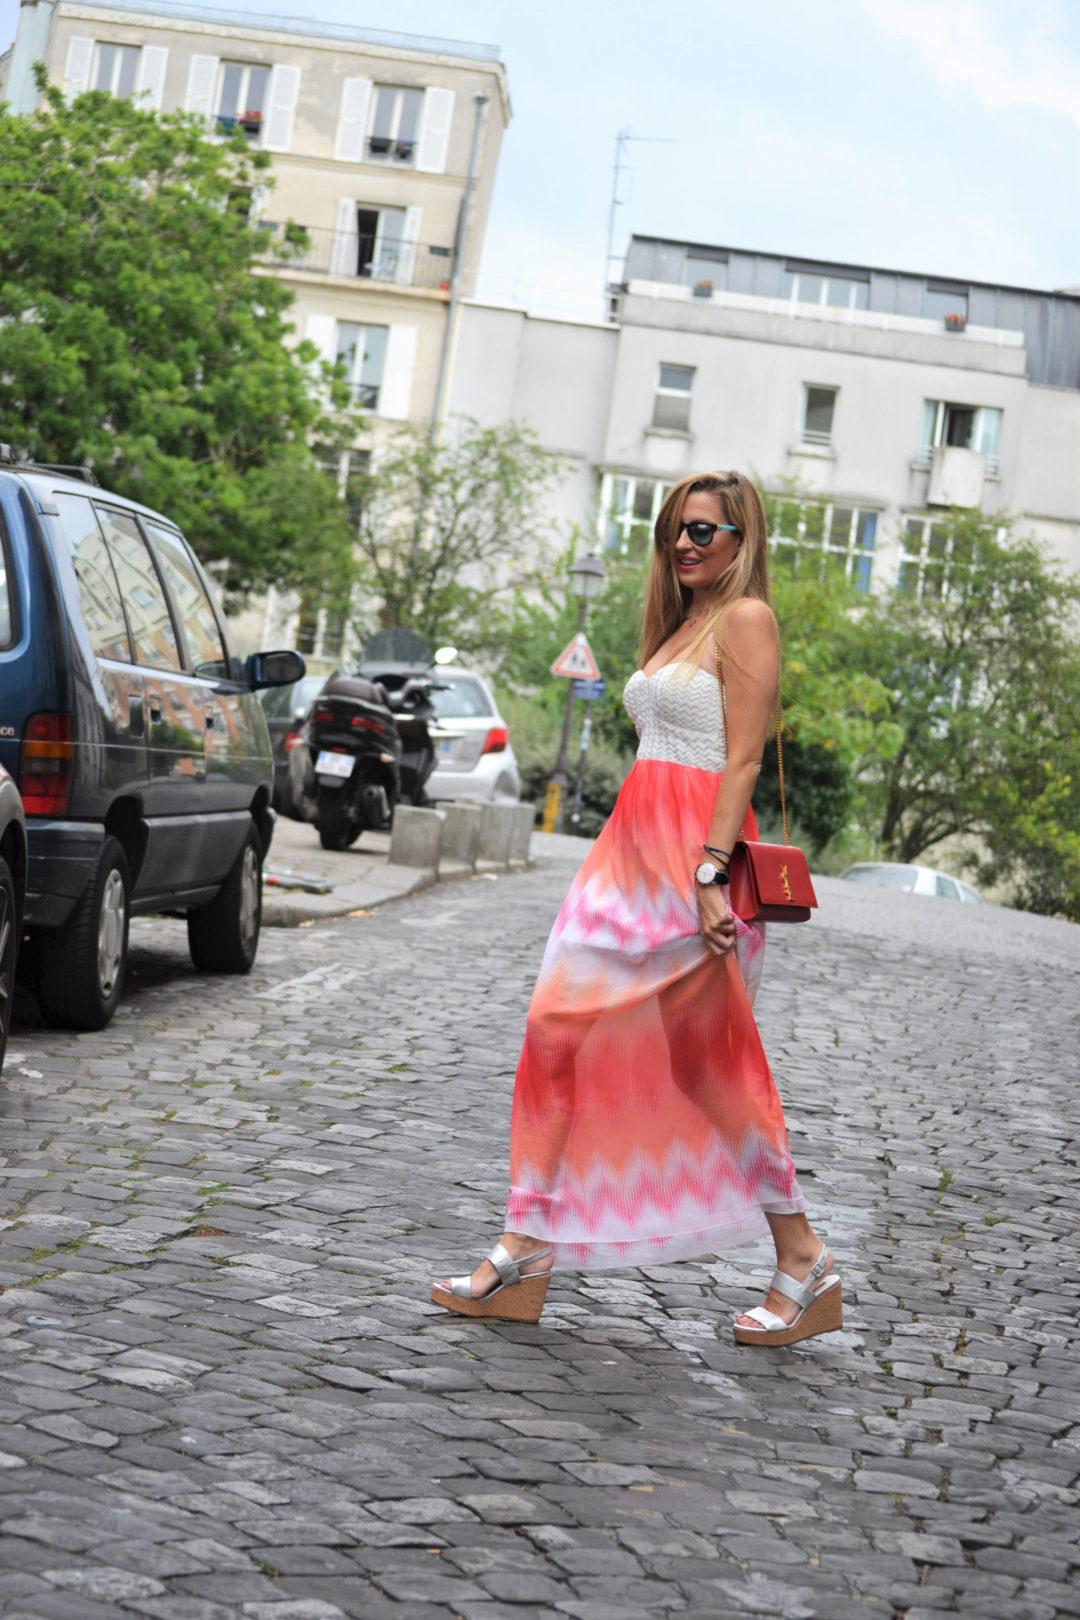 Montmartre_Paris_Sacre_Coeur_Lara_Martin_Gilarranz_Monogram_Yves_Saint_Laurent_YSL_Bymyheels (12)